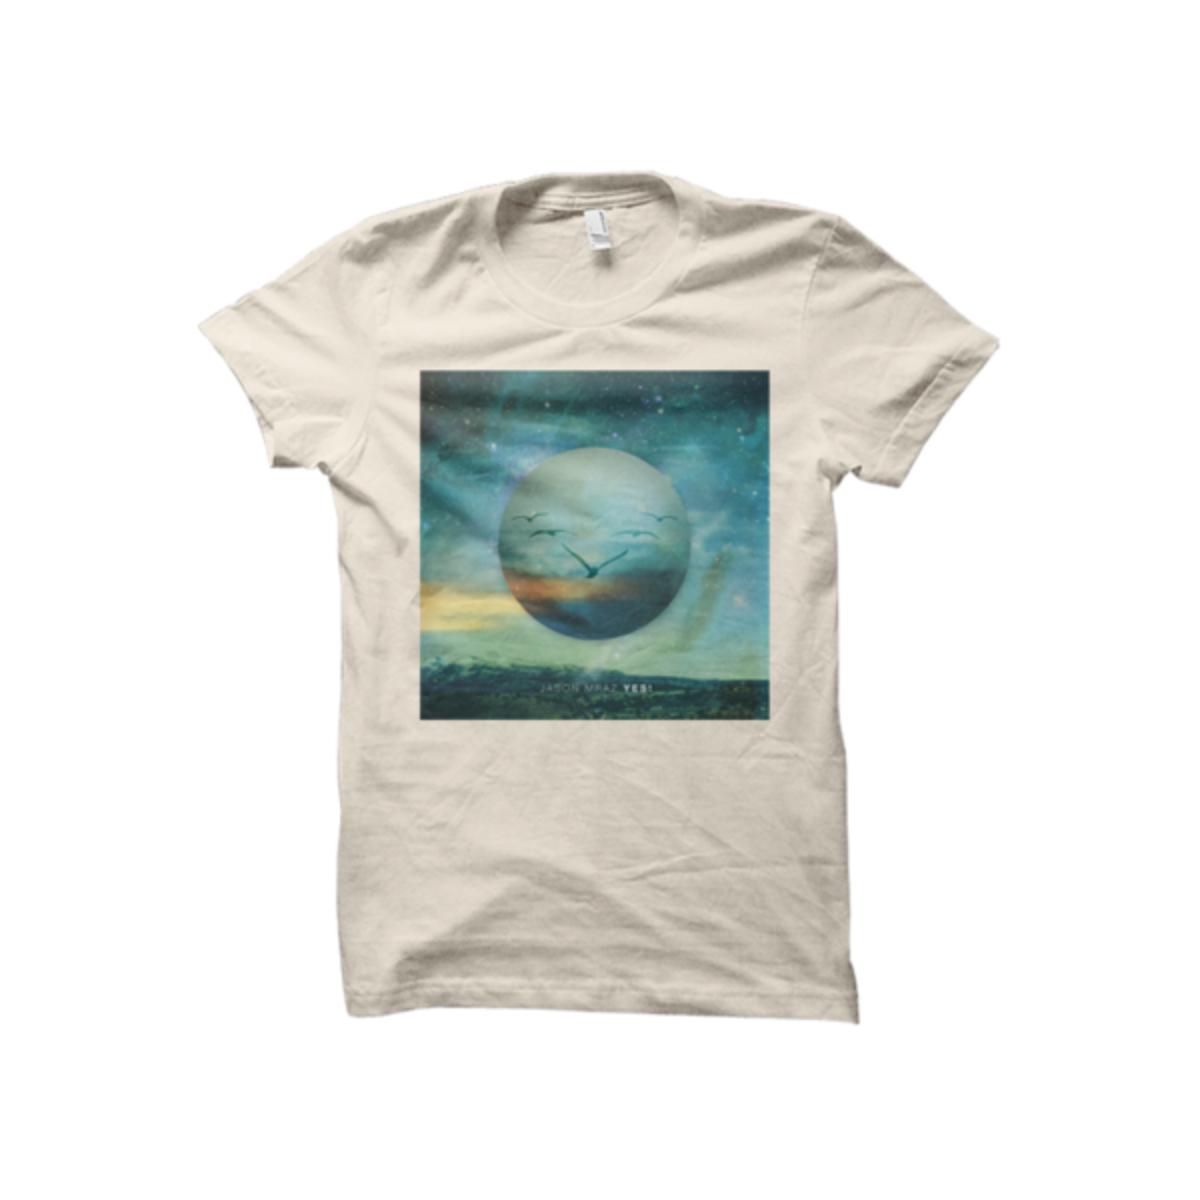 Jason Mraz Yes! Album Cover Women's T-shirt